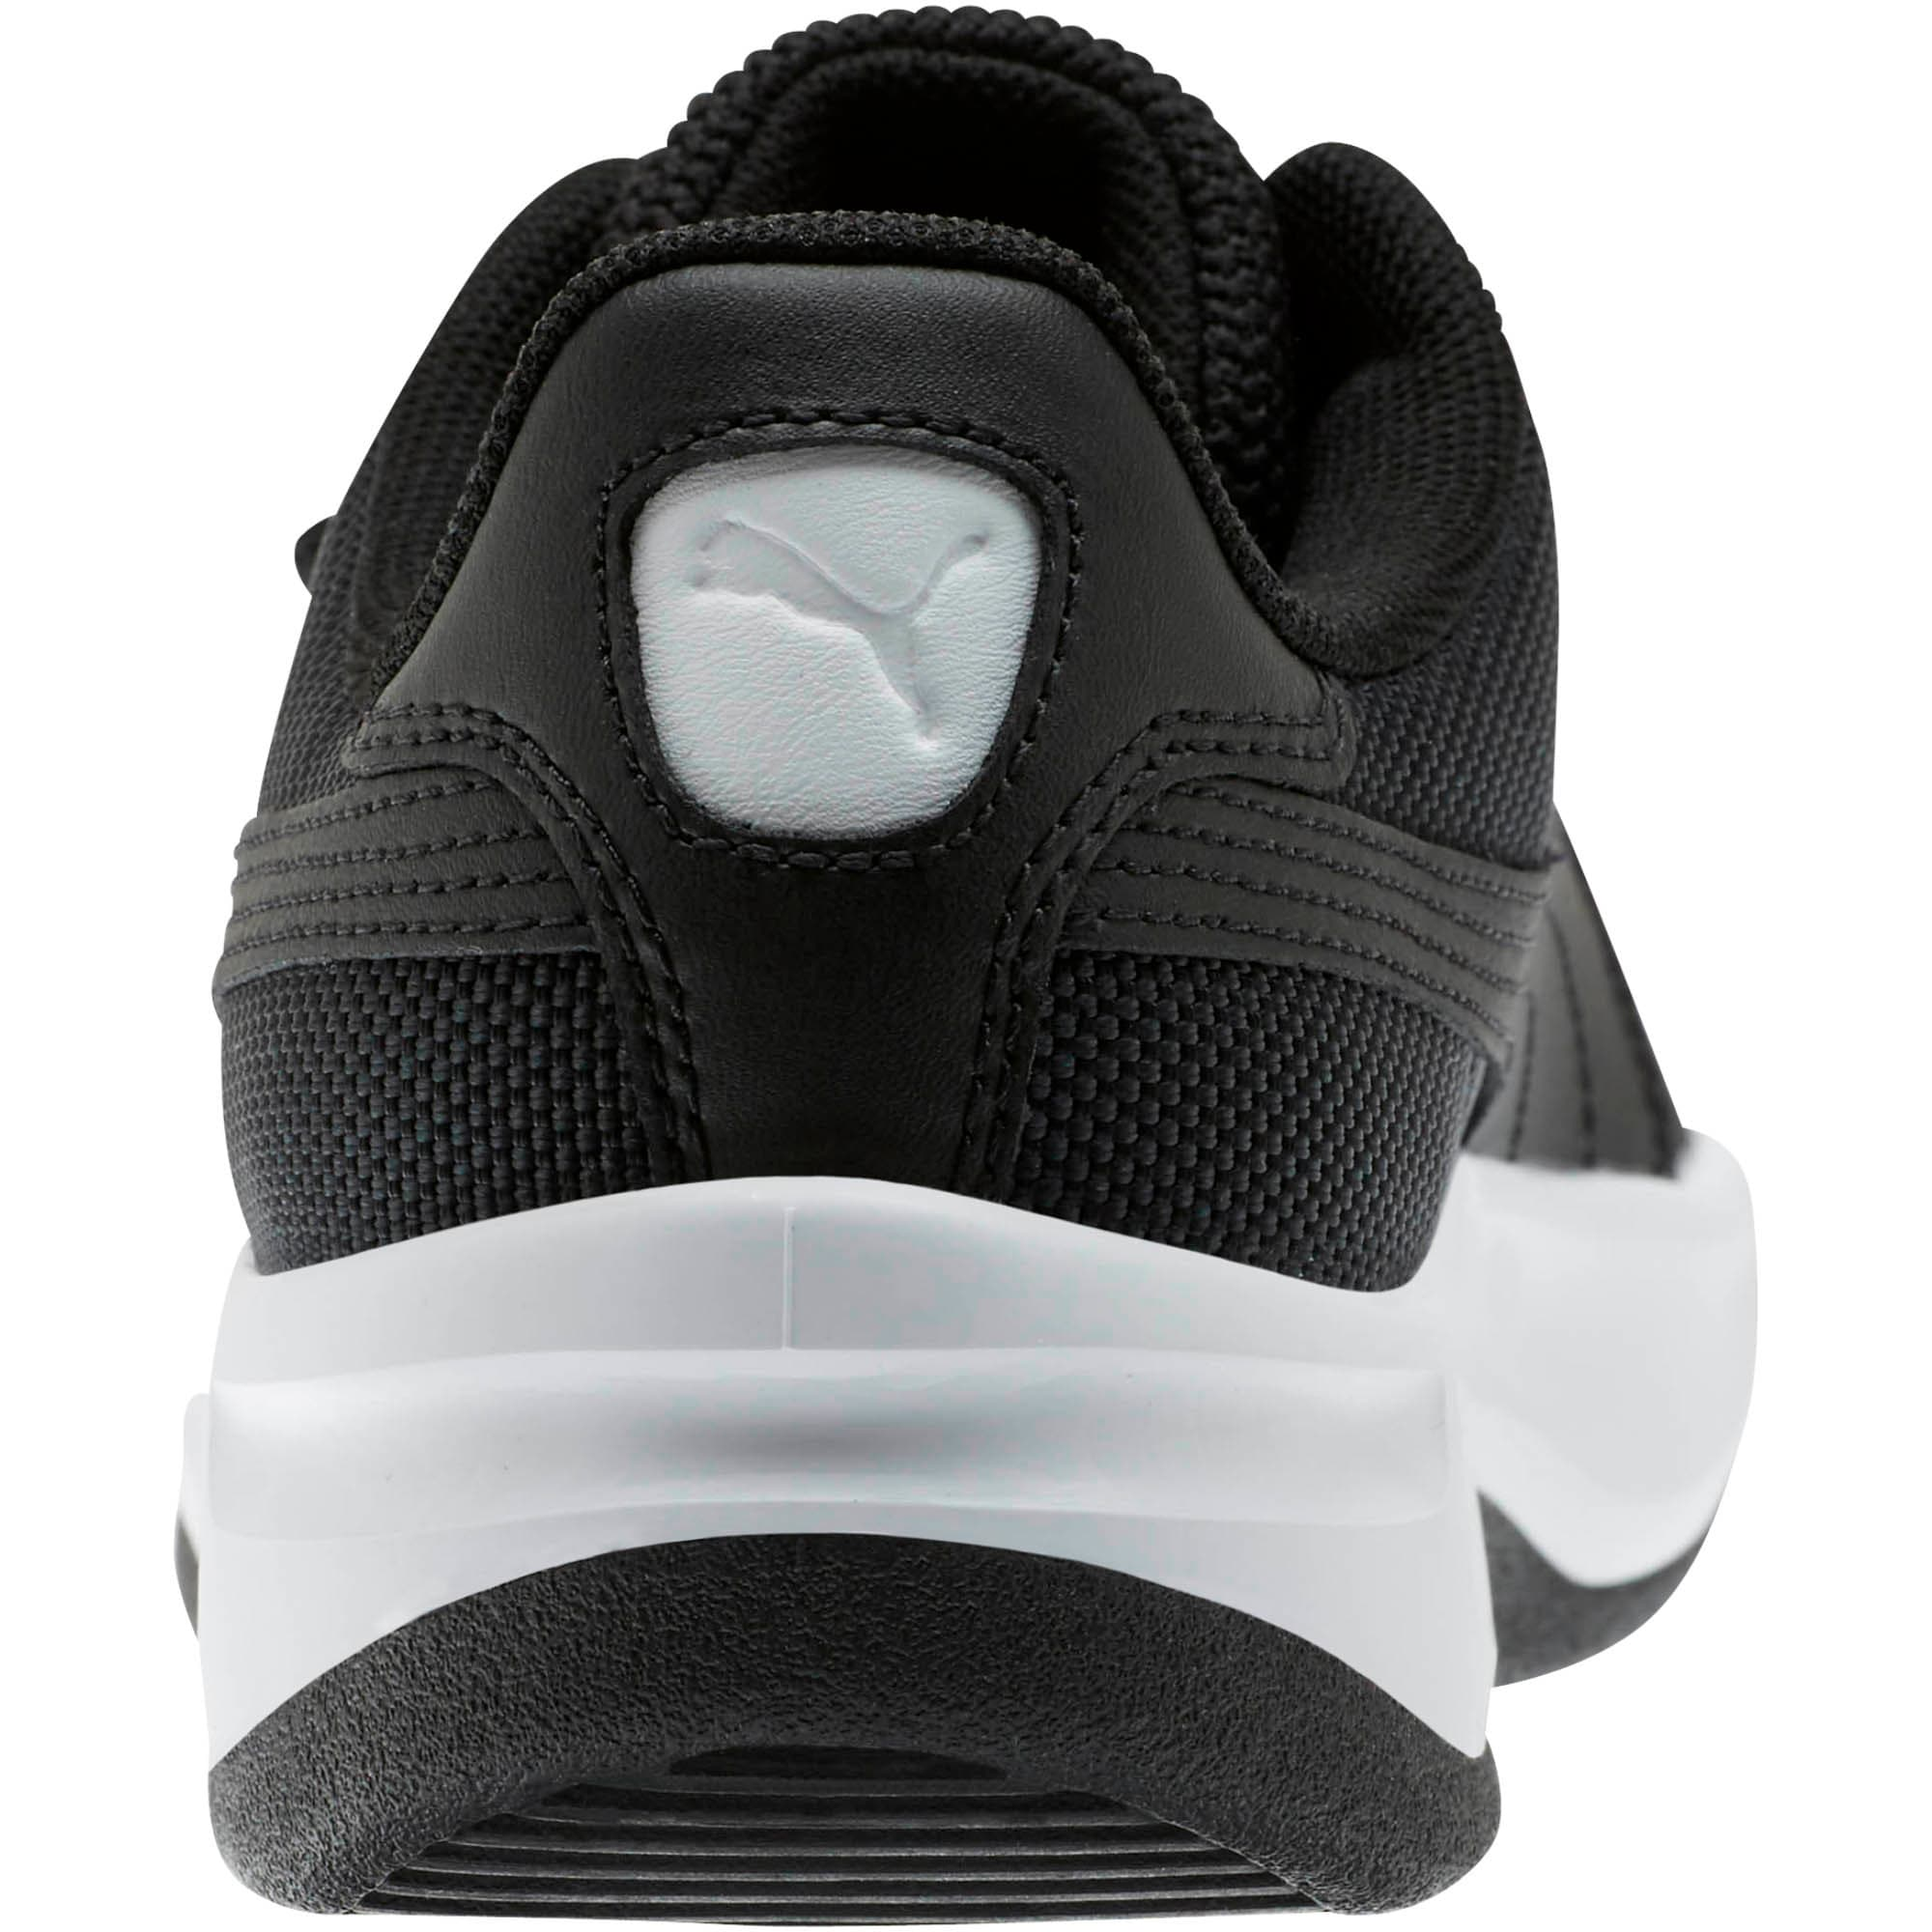 Thumbnail 3 of California Sneakers JR, P Black-P White-P Black, medium